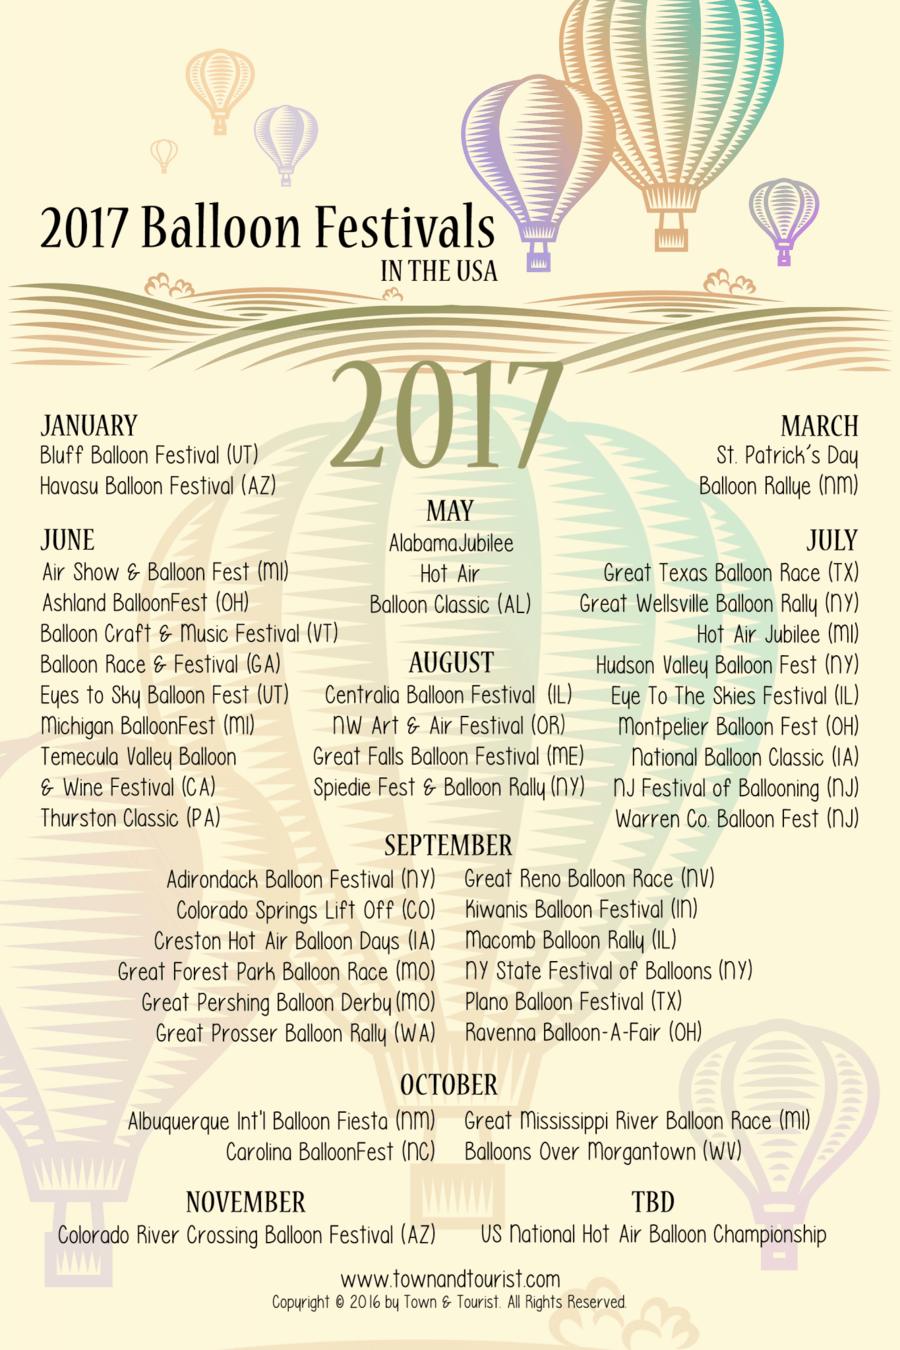 Georgia festivals 2017 2018 find what to do in georgia for Craft shows in albuquerque 2017